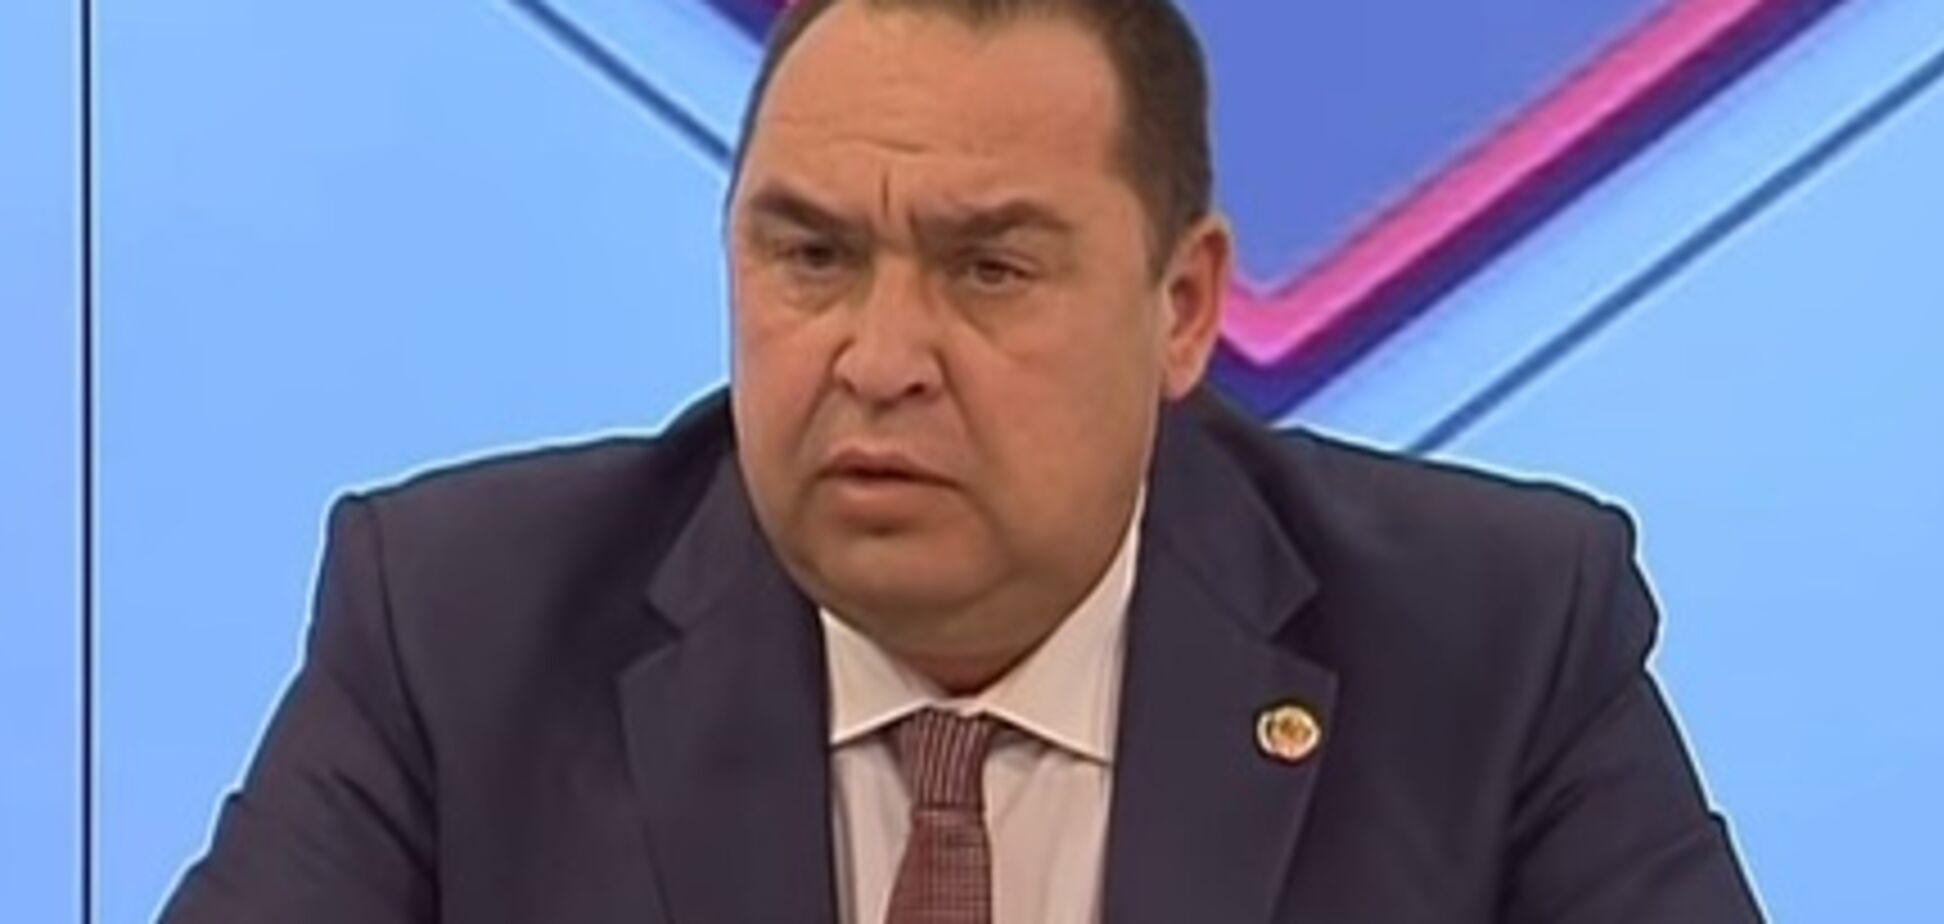 ЛНР, Донбас, Україна, Ігор Плотницький